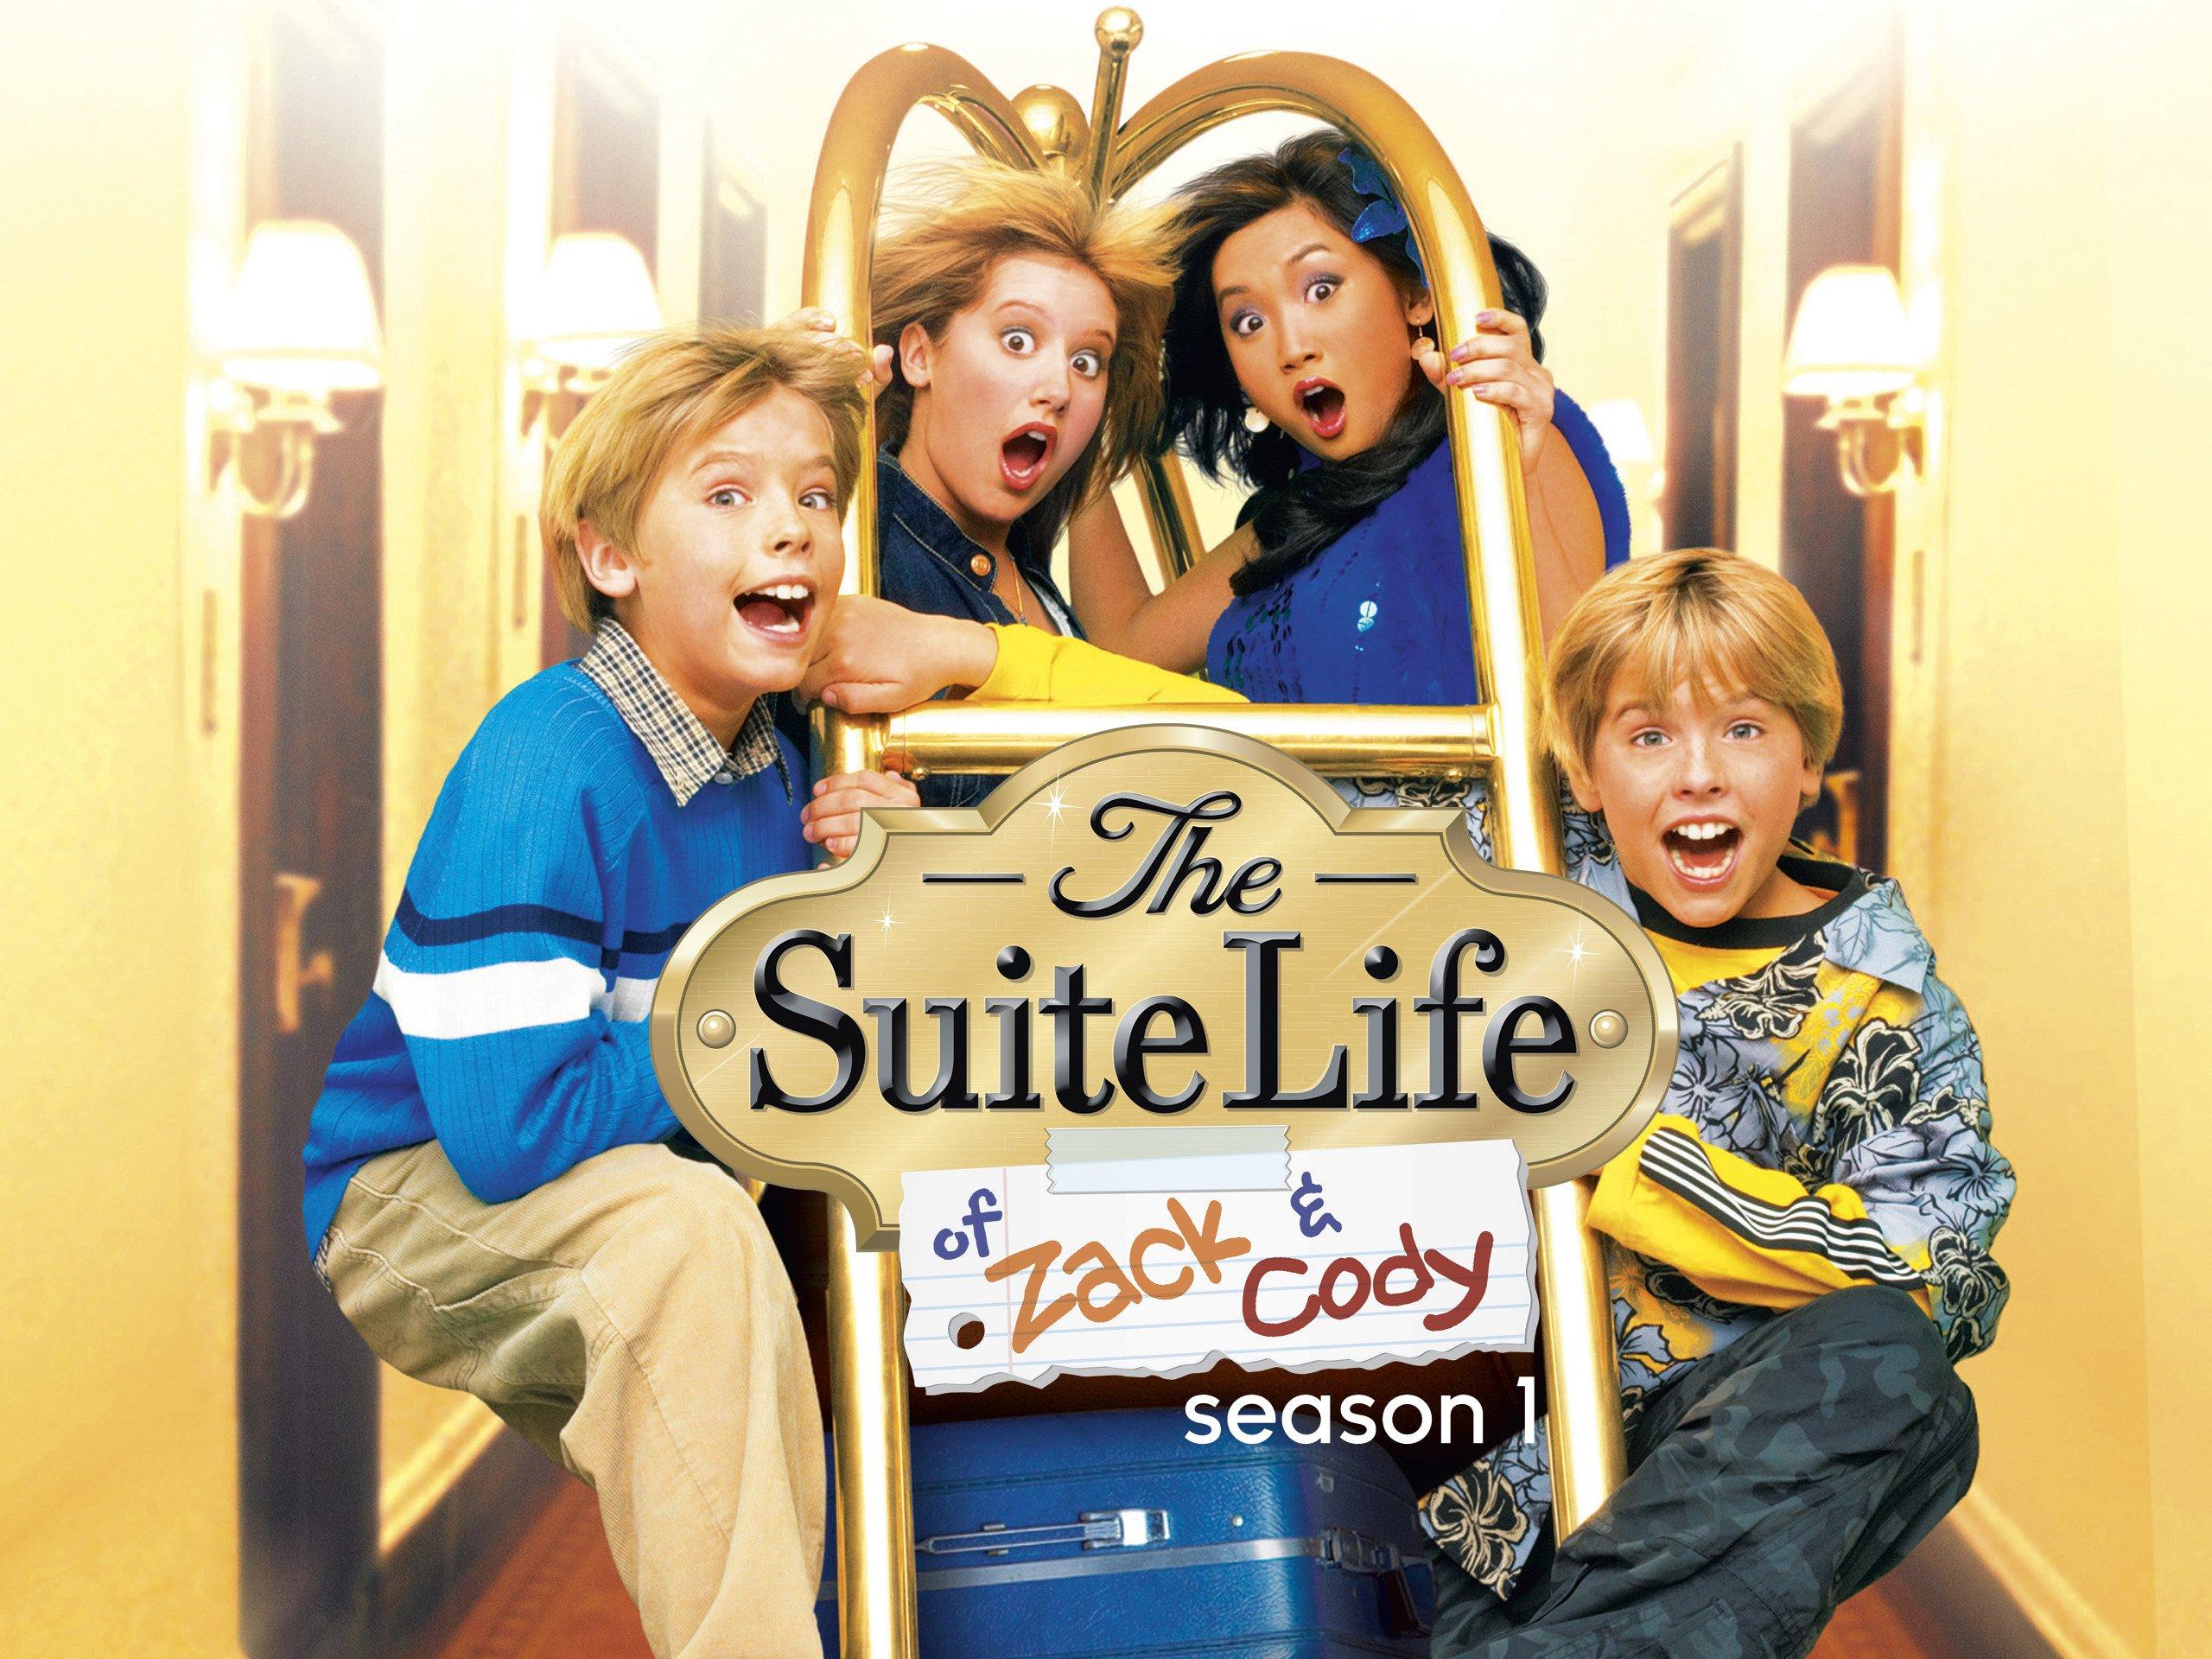 The Suite Life of Zack \u0026 Cody, Season 1 Disney Enterprises